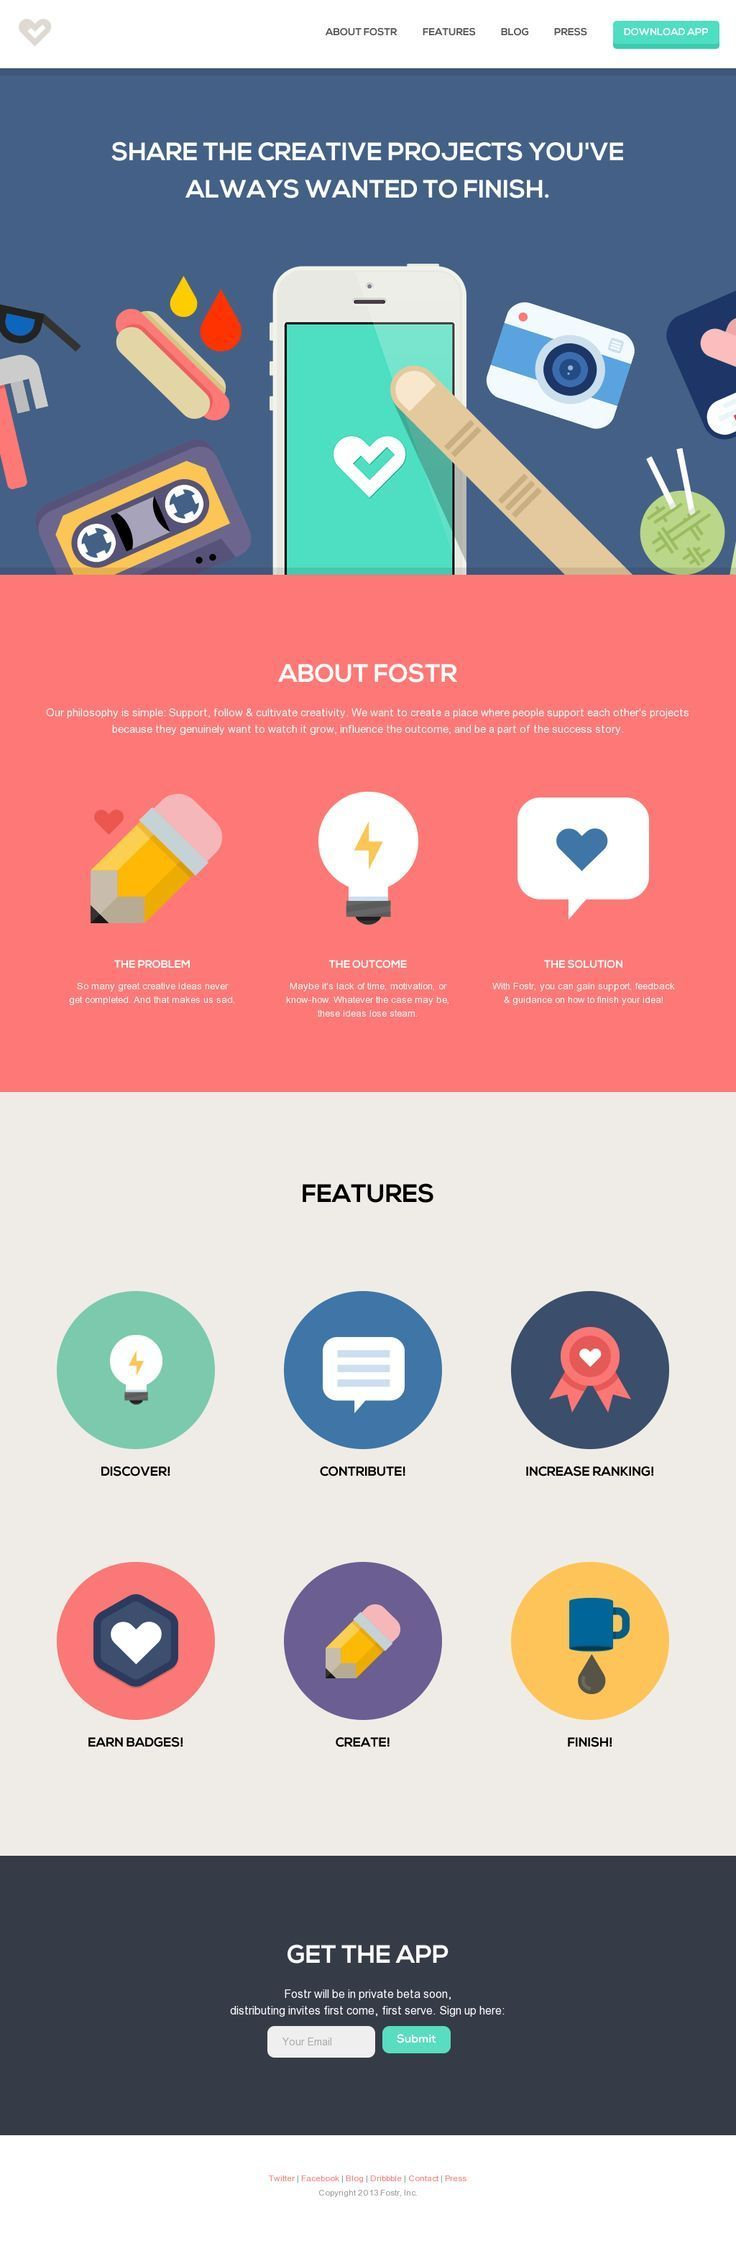 FlatWebDesign Apps & Tools